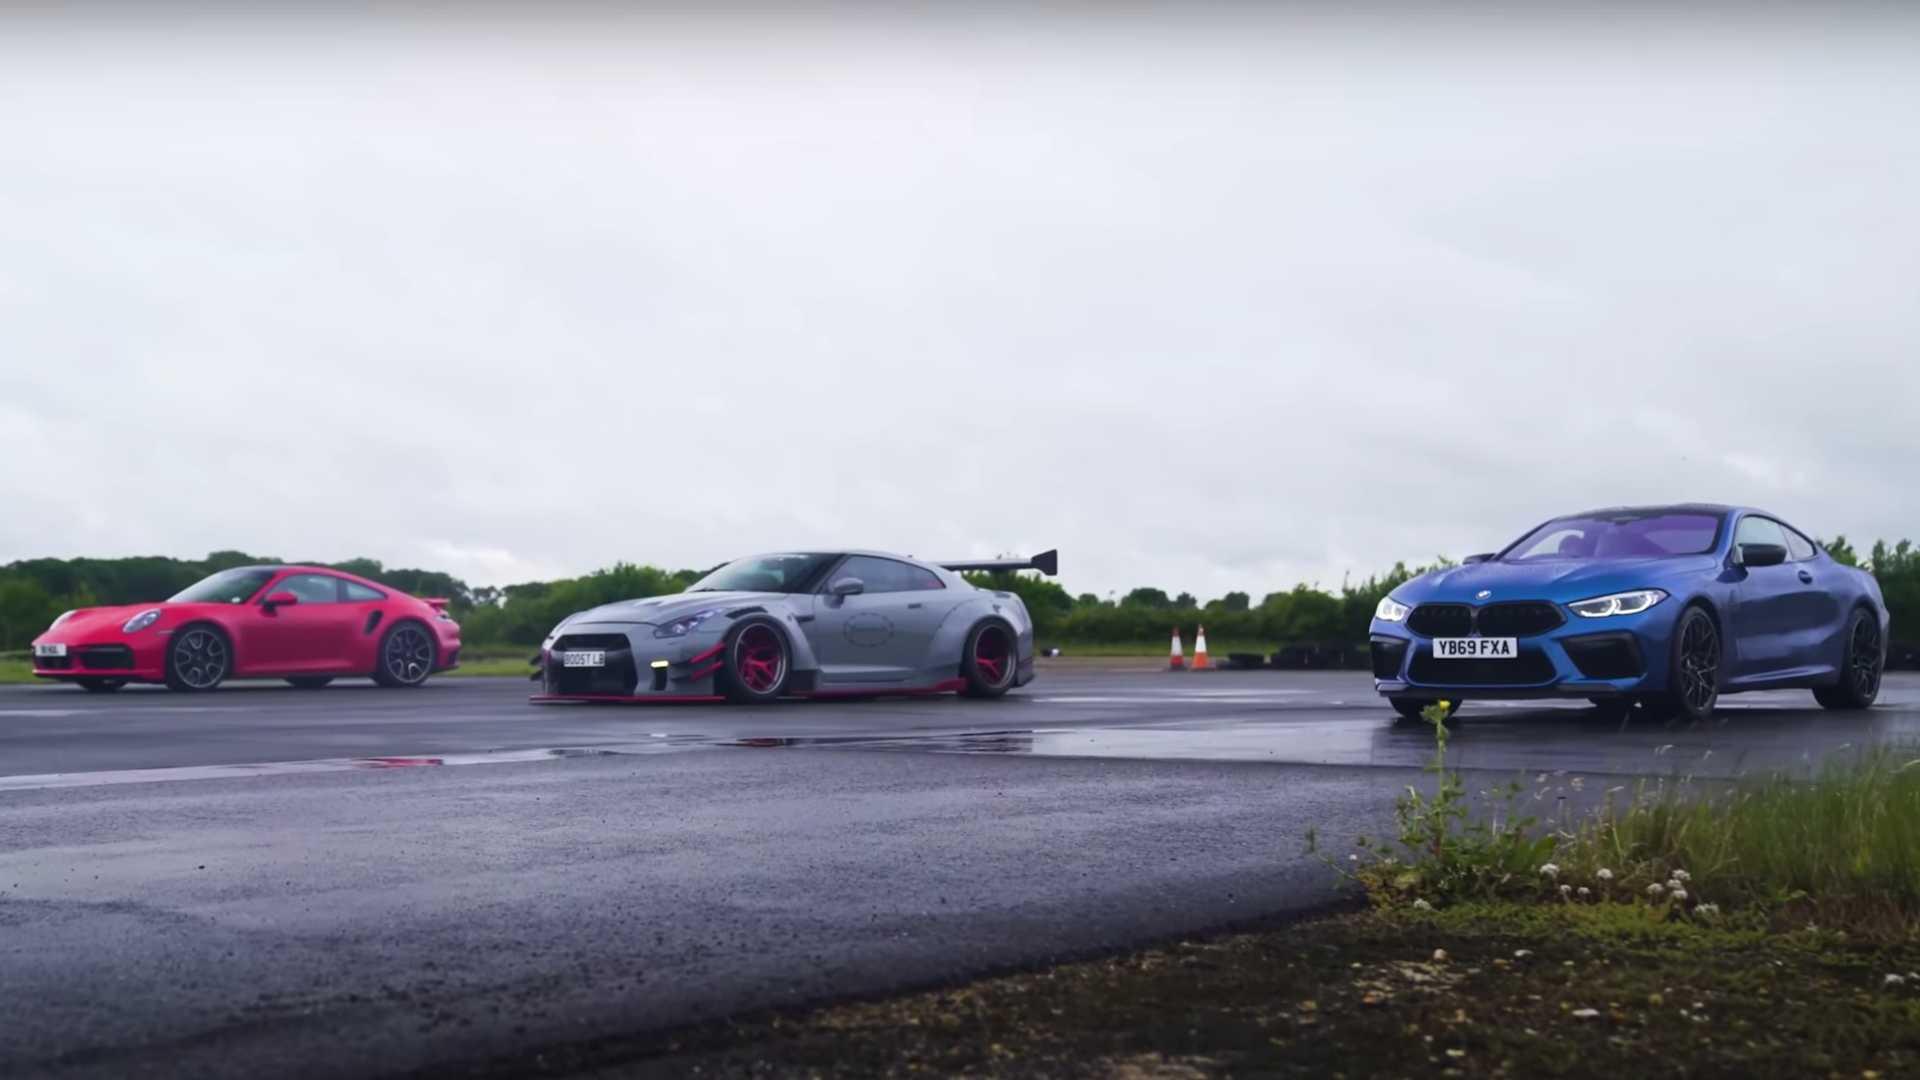 Porsche 911 Turbo S vs. BMW M8 vs. Nissan GT-R